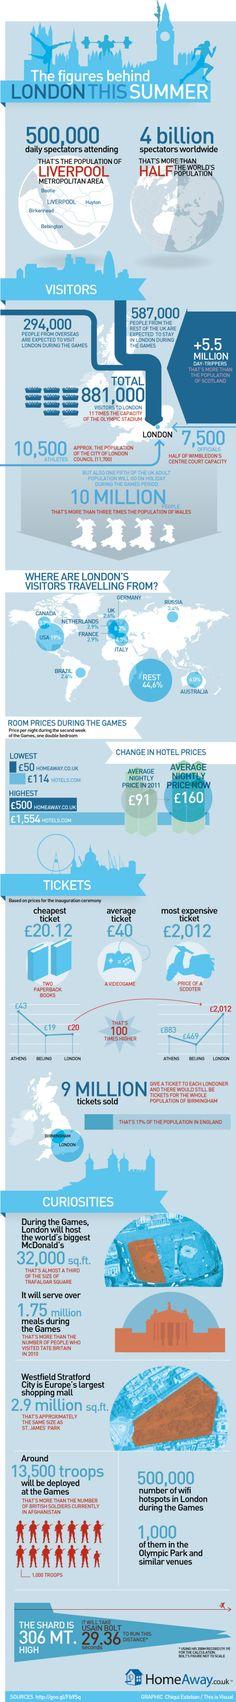 15. London 2012 info graphic